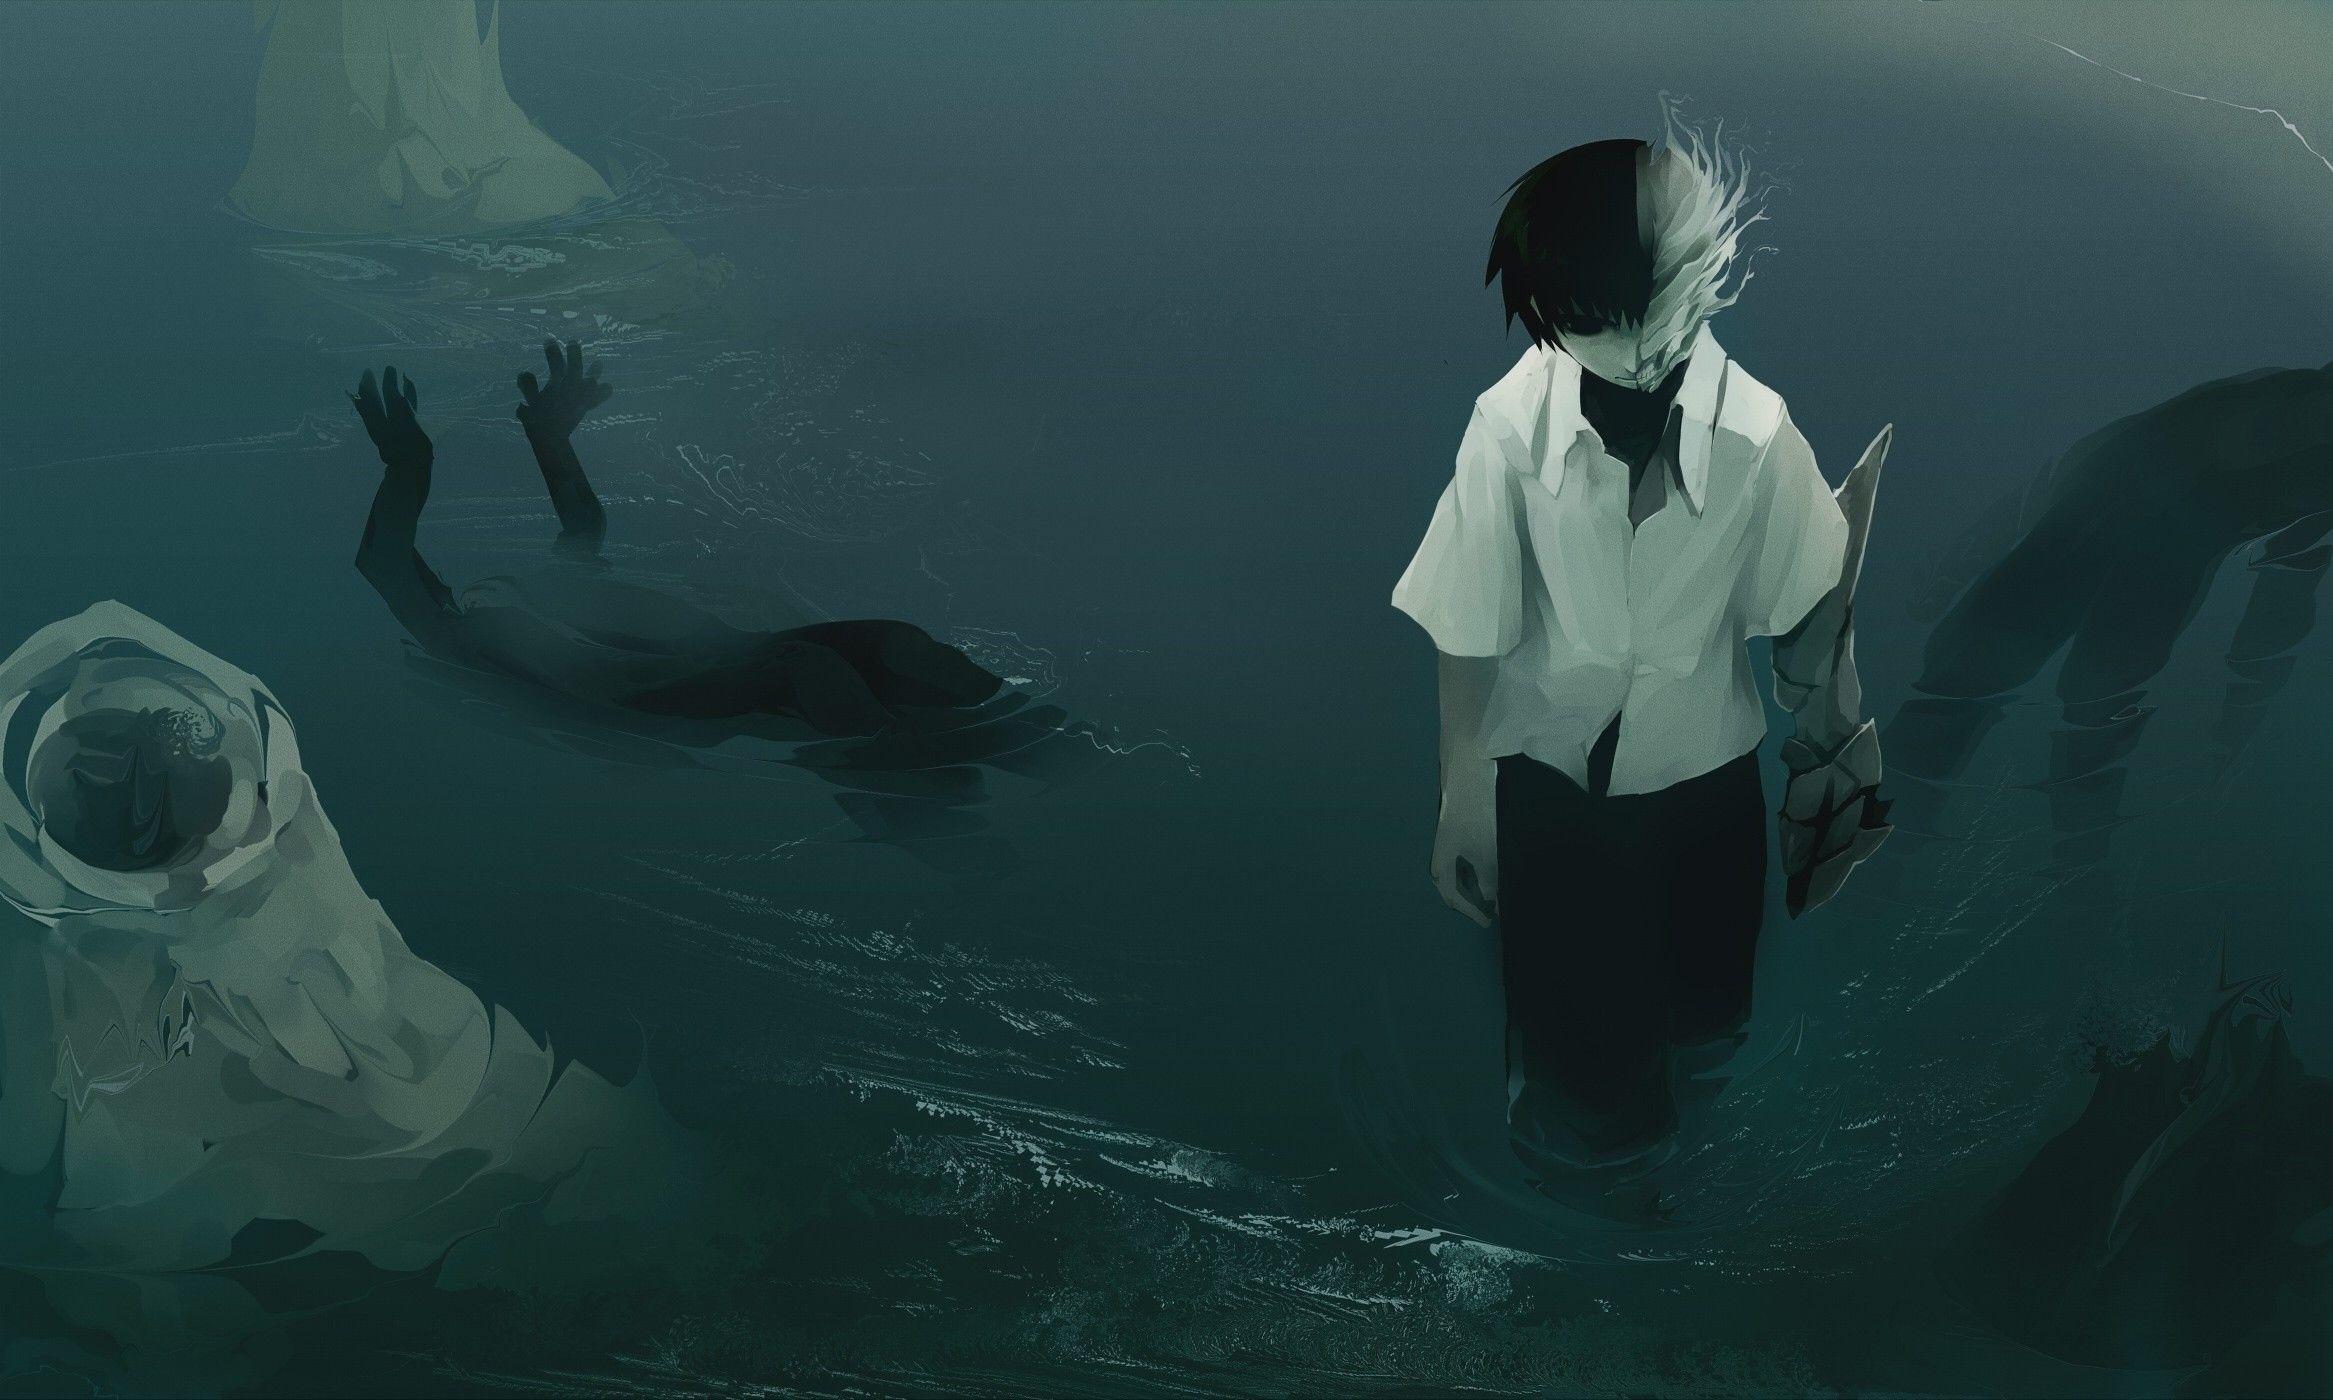 artwork, anime, empty :: Wallpapers